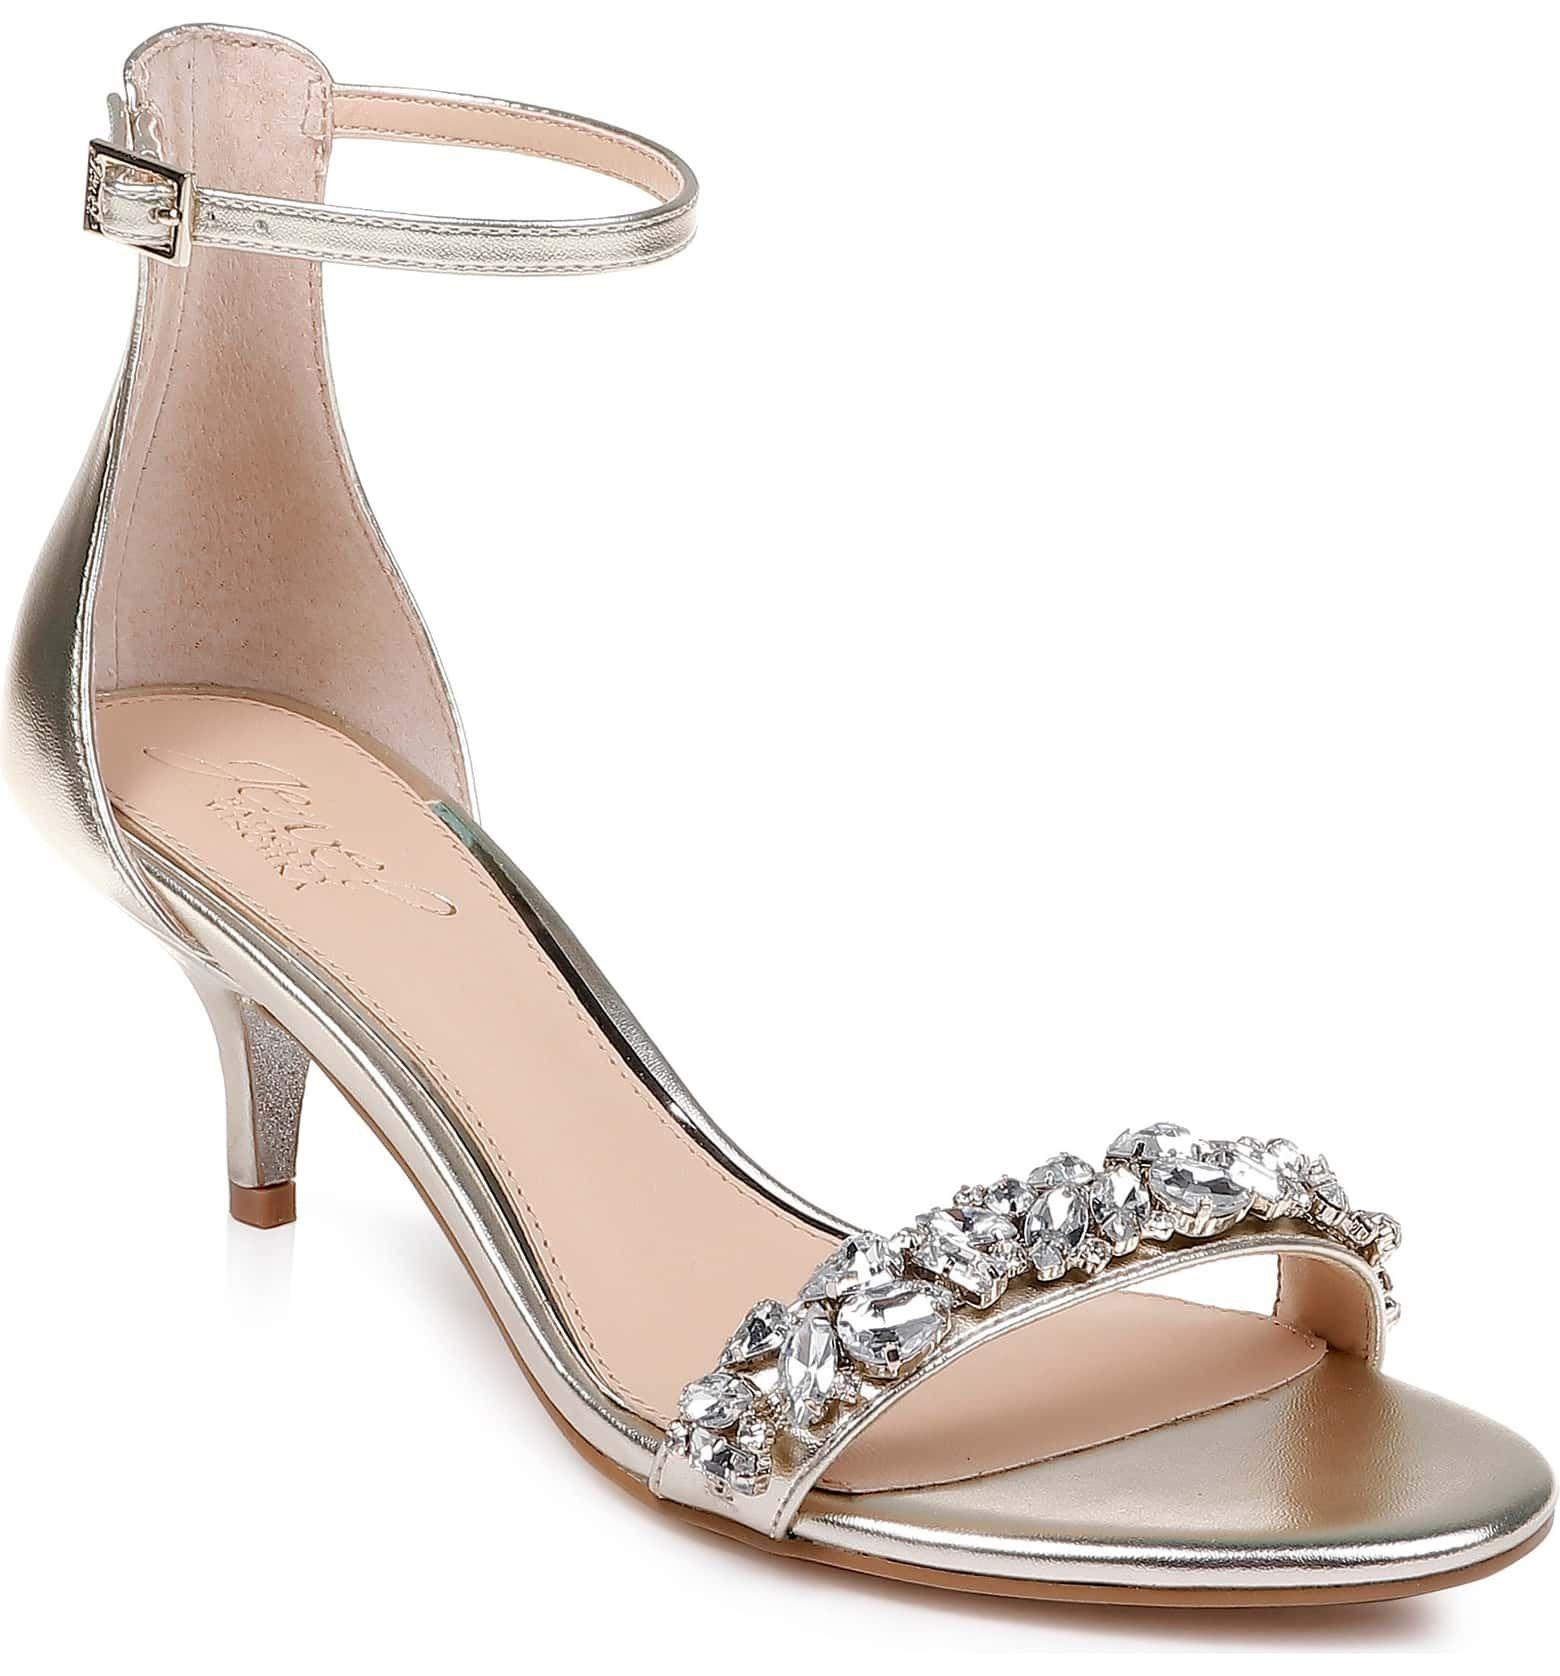 Pin By Chung Li On Prom In 2020 Evening Sandals Kitten Heel Sandals Jewel Badgley Mischka